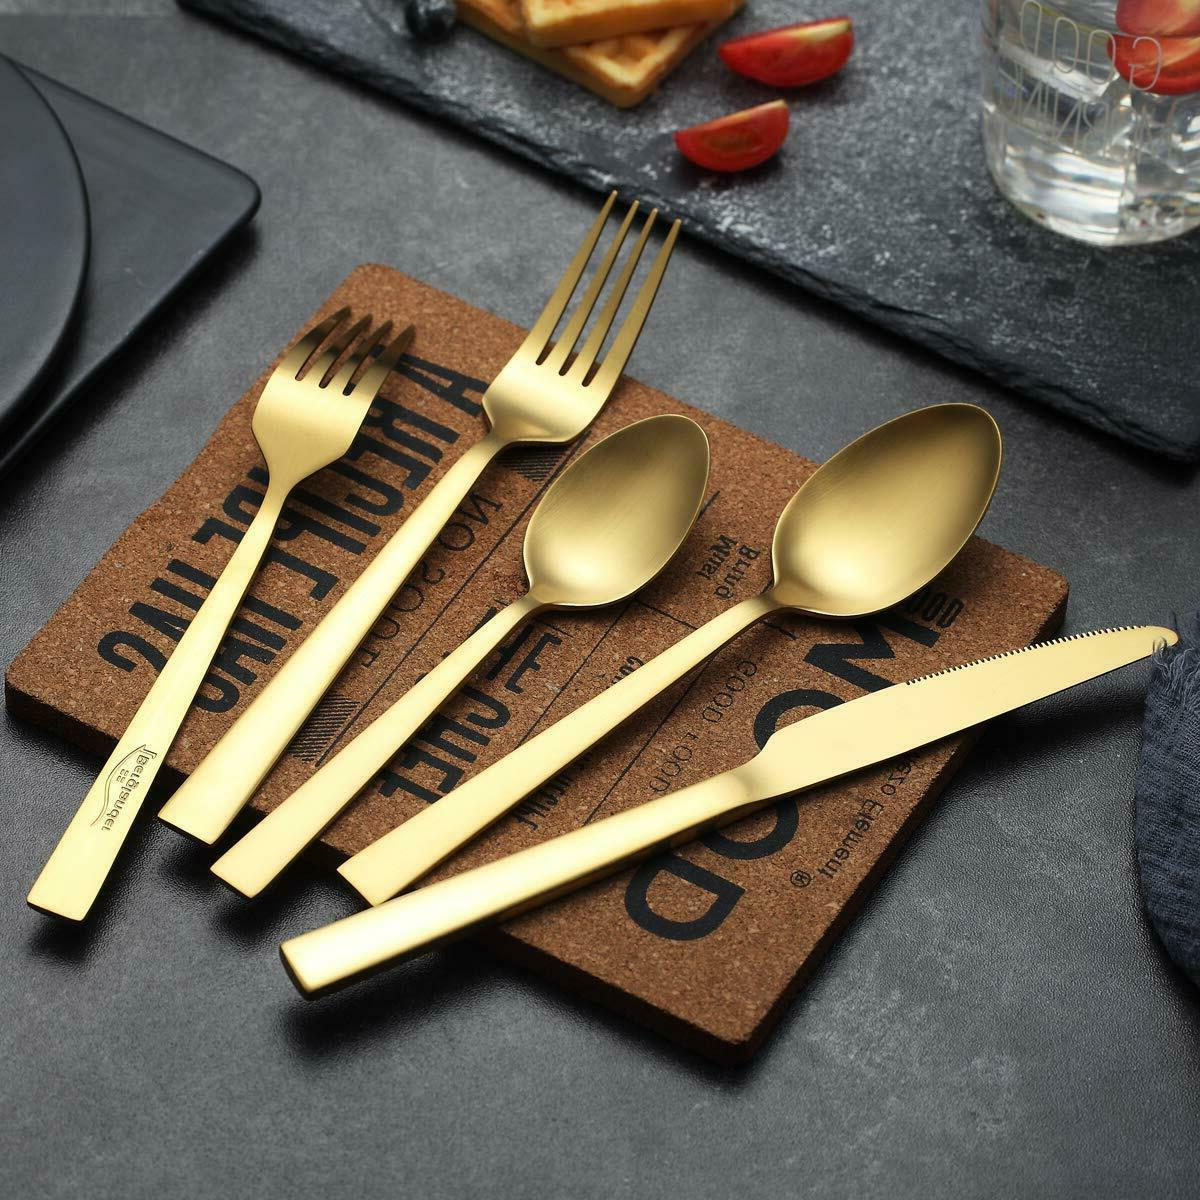 Jeaker Matte Steel Silverware Golden Flatware Set